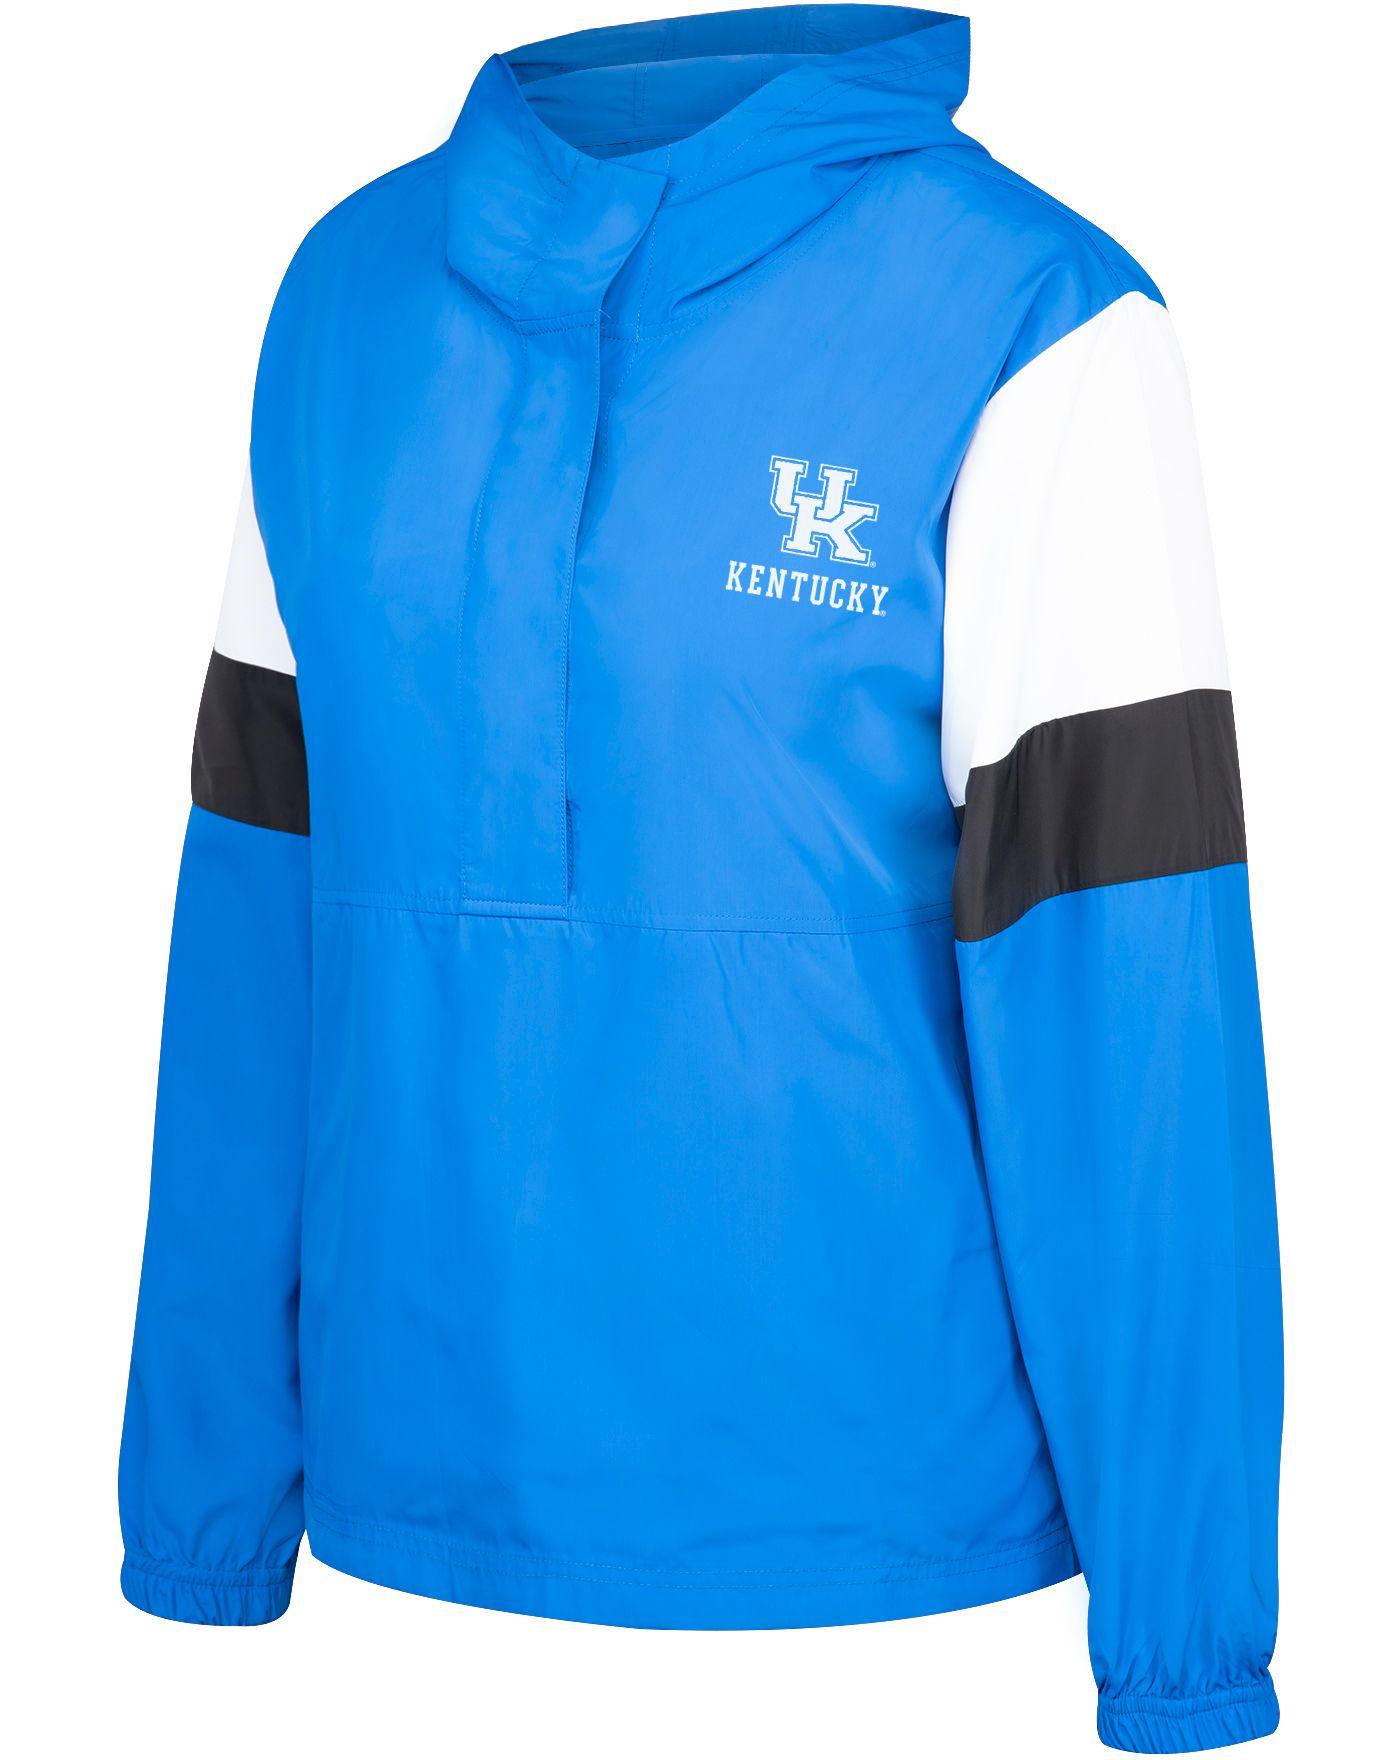 Top of the World Women's Kentucky Wildcats Blue Dynamite Jacket